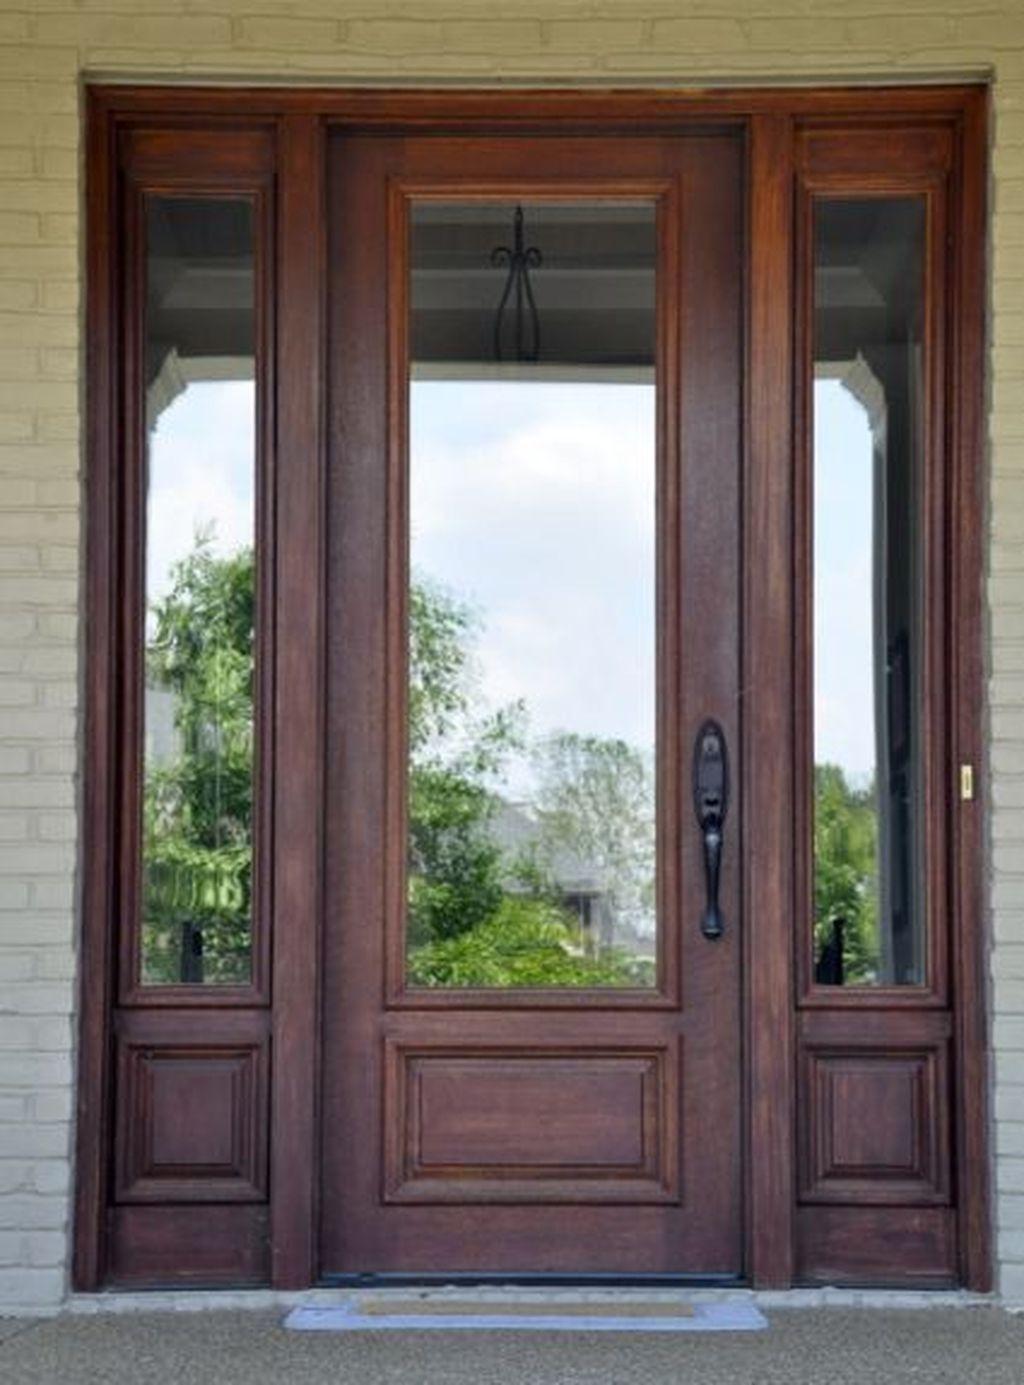 35 Gorgeous Farmhouse Front Door Entrance Design Ideas To Apply Asap Wood Front Doors Best Front Doors Front Entry Doors